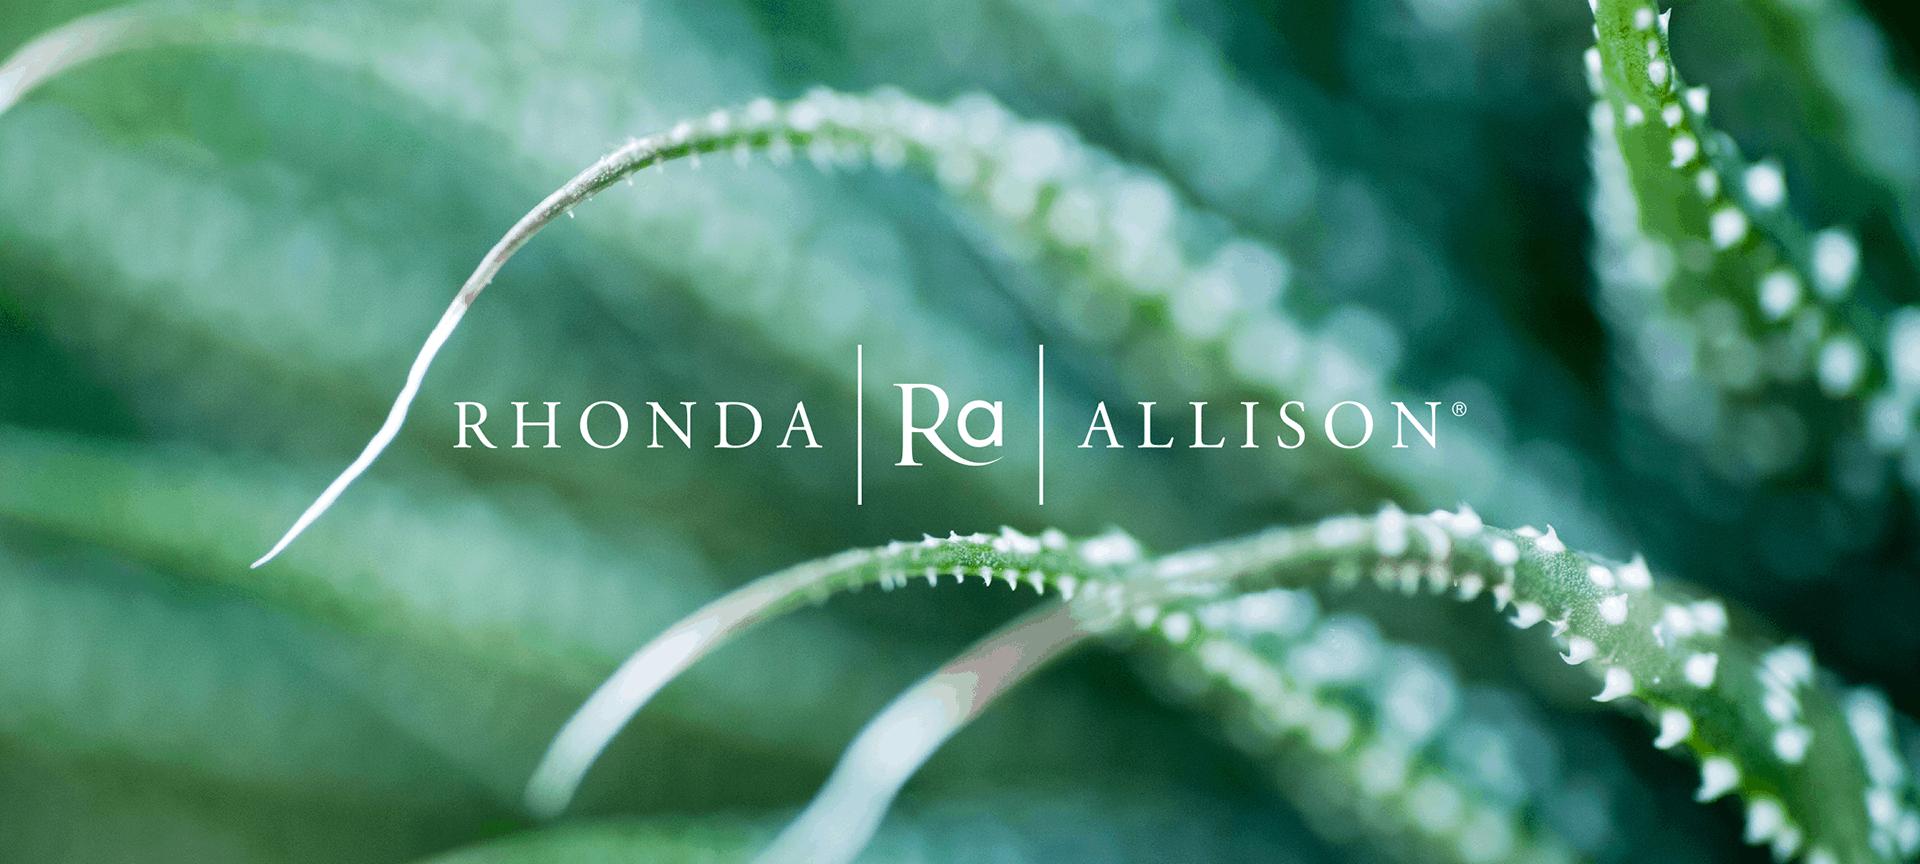 1_web_RhondaAllison_SP